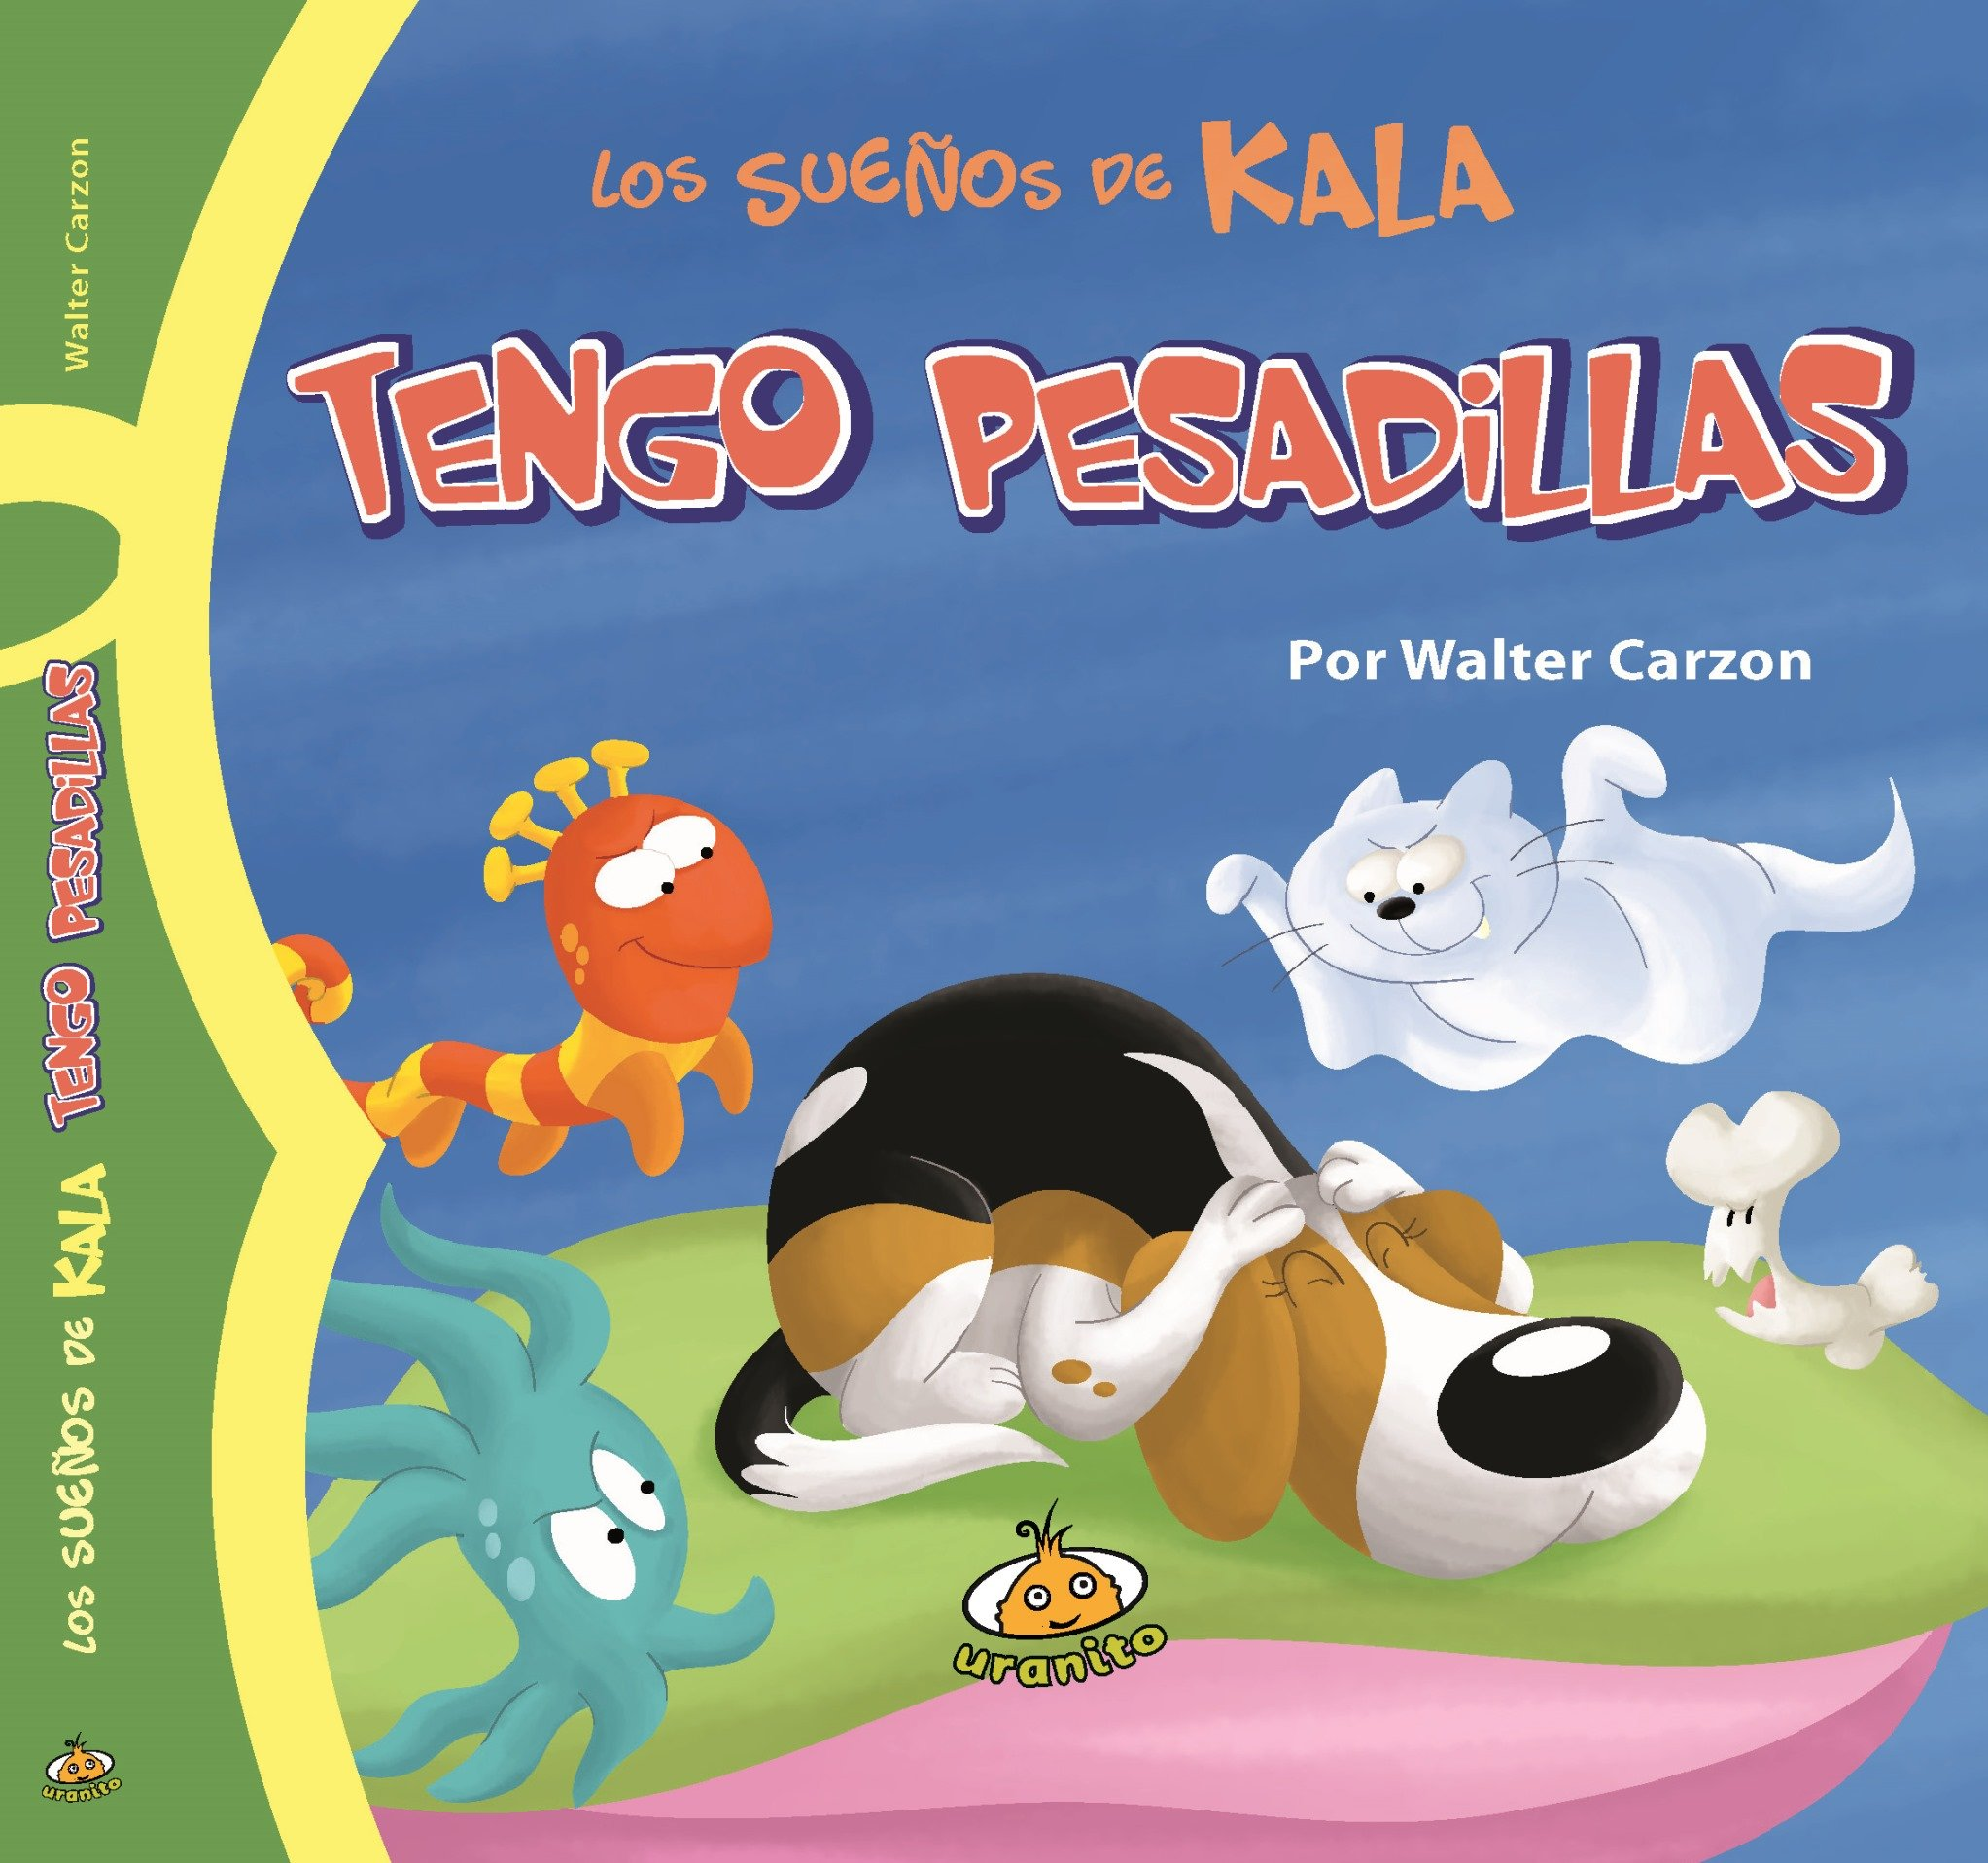 Tengo pesadillas (Spanish Edition) (Los Suenos De Kala) PDF